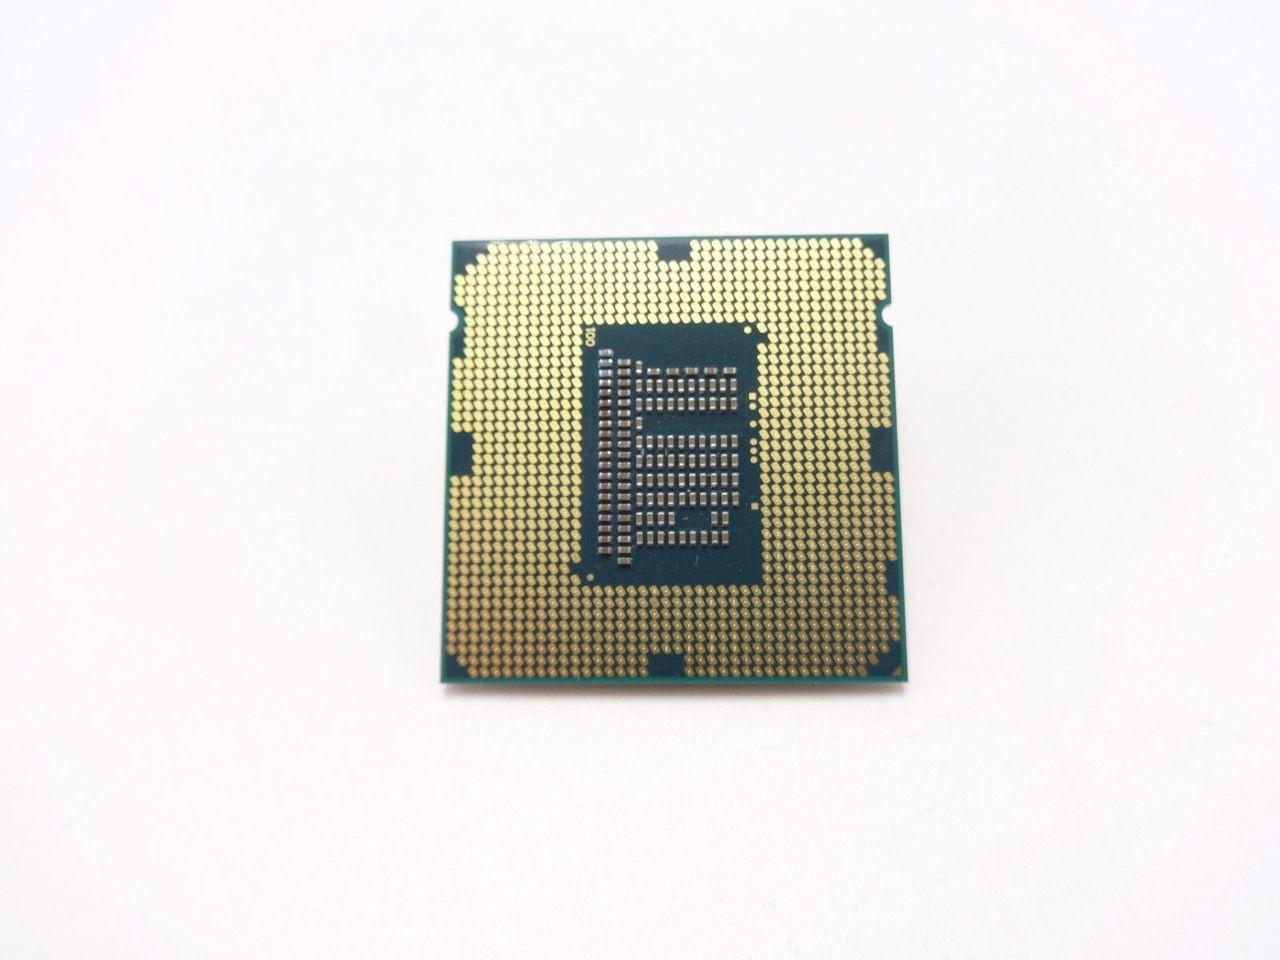 Intel Core i3-3220 3.3GHz 3.30GHz 3M SR0RG Socket 1155 Ivy Bridge CPU Processor